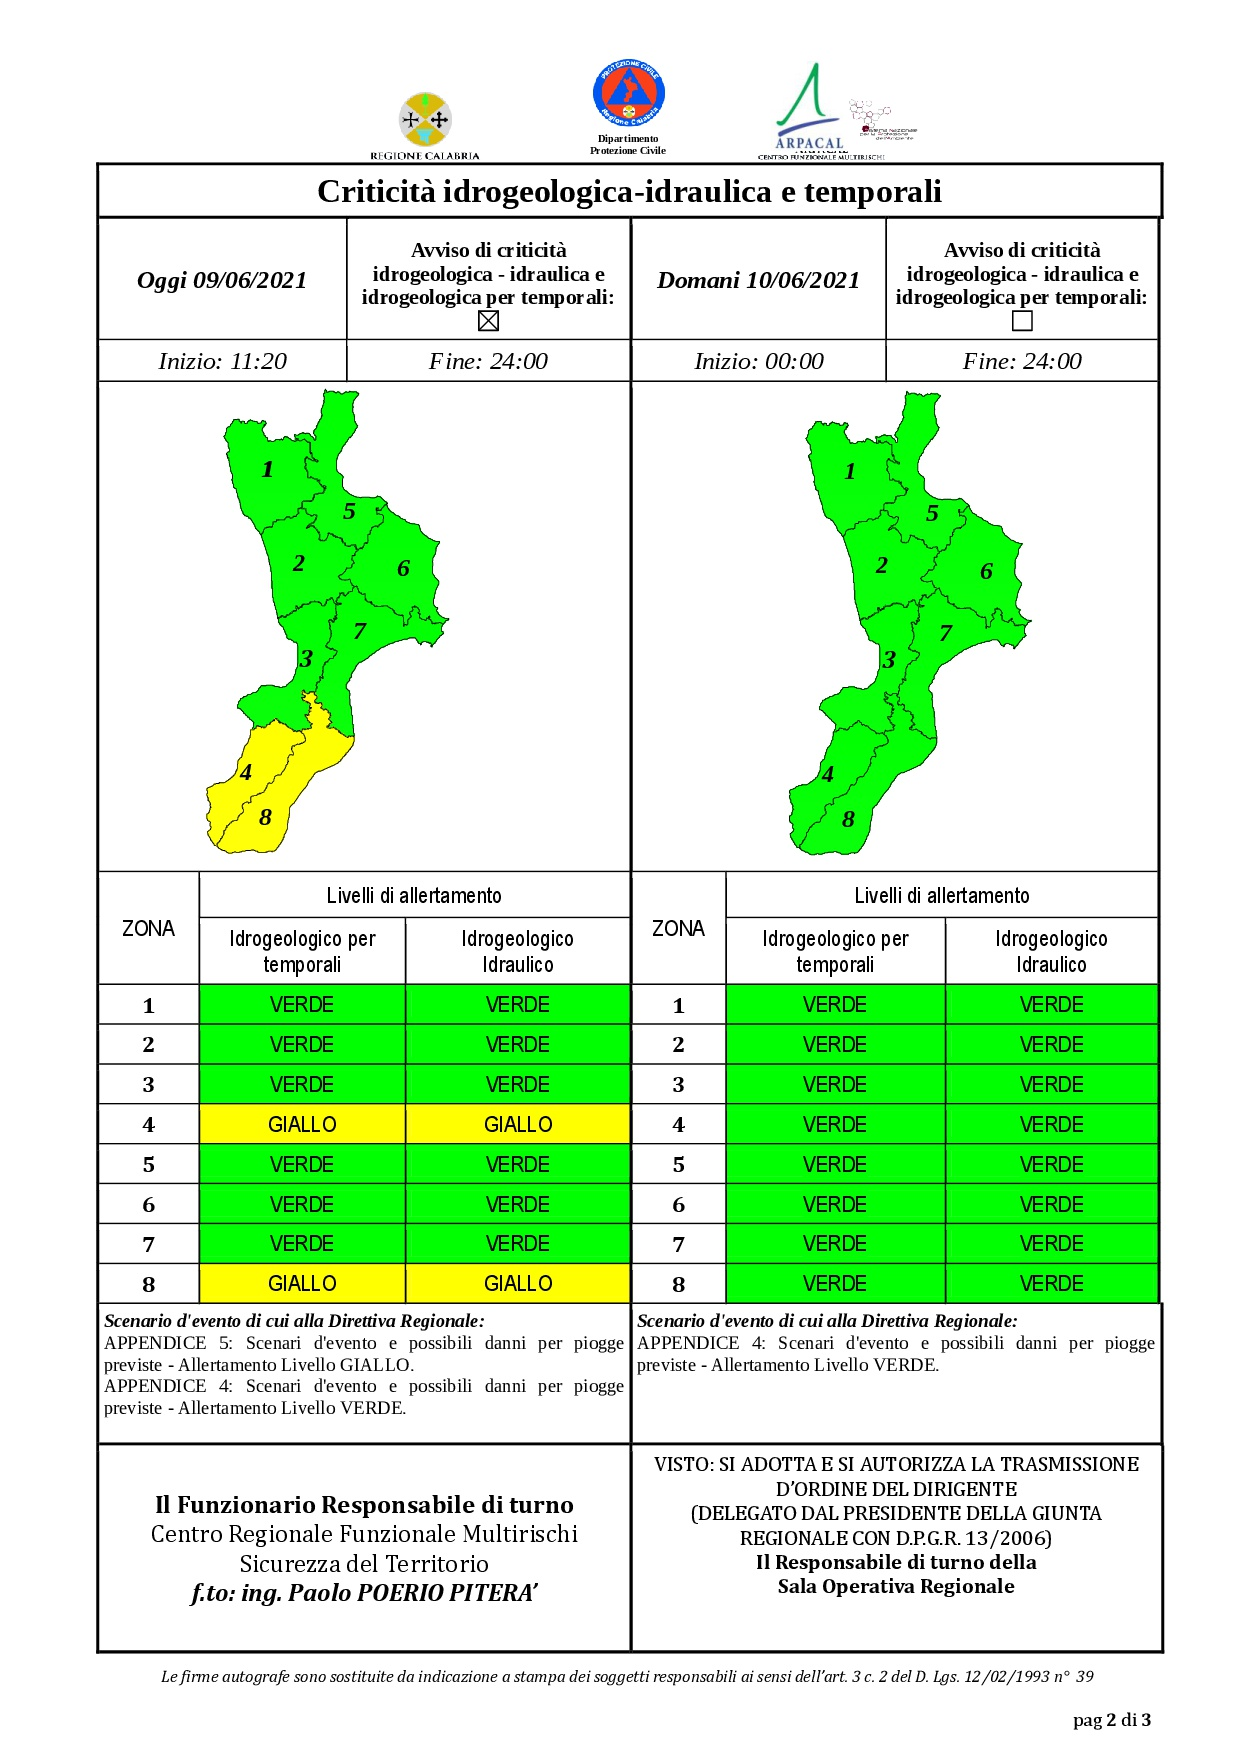 Criticità idrogeologica-idraulica e temporali in Calabria 09-06-2021